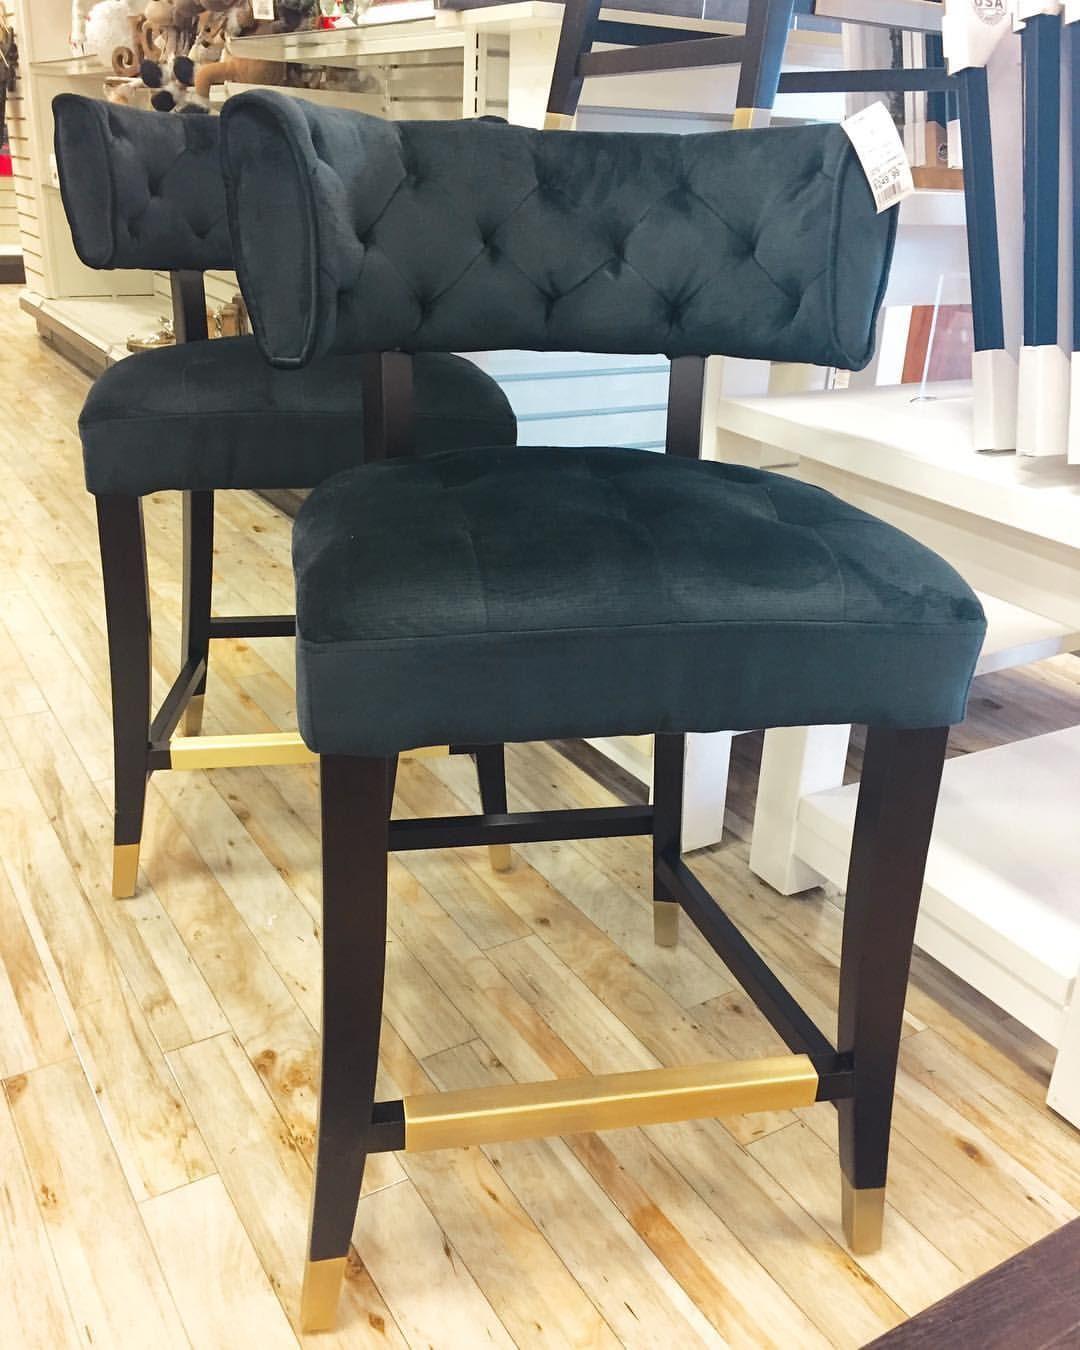 Homesense find a set of 4 black tufted bar stools with brass homesense find a set of 4 black tufted bar stools with brass capped feet and geotapseo Choice Image